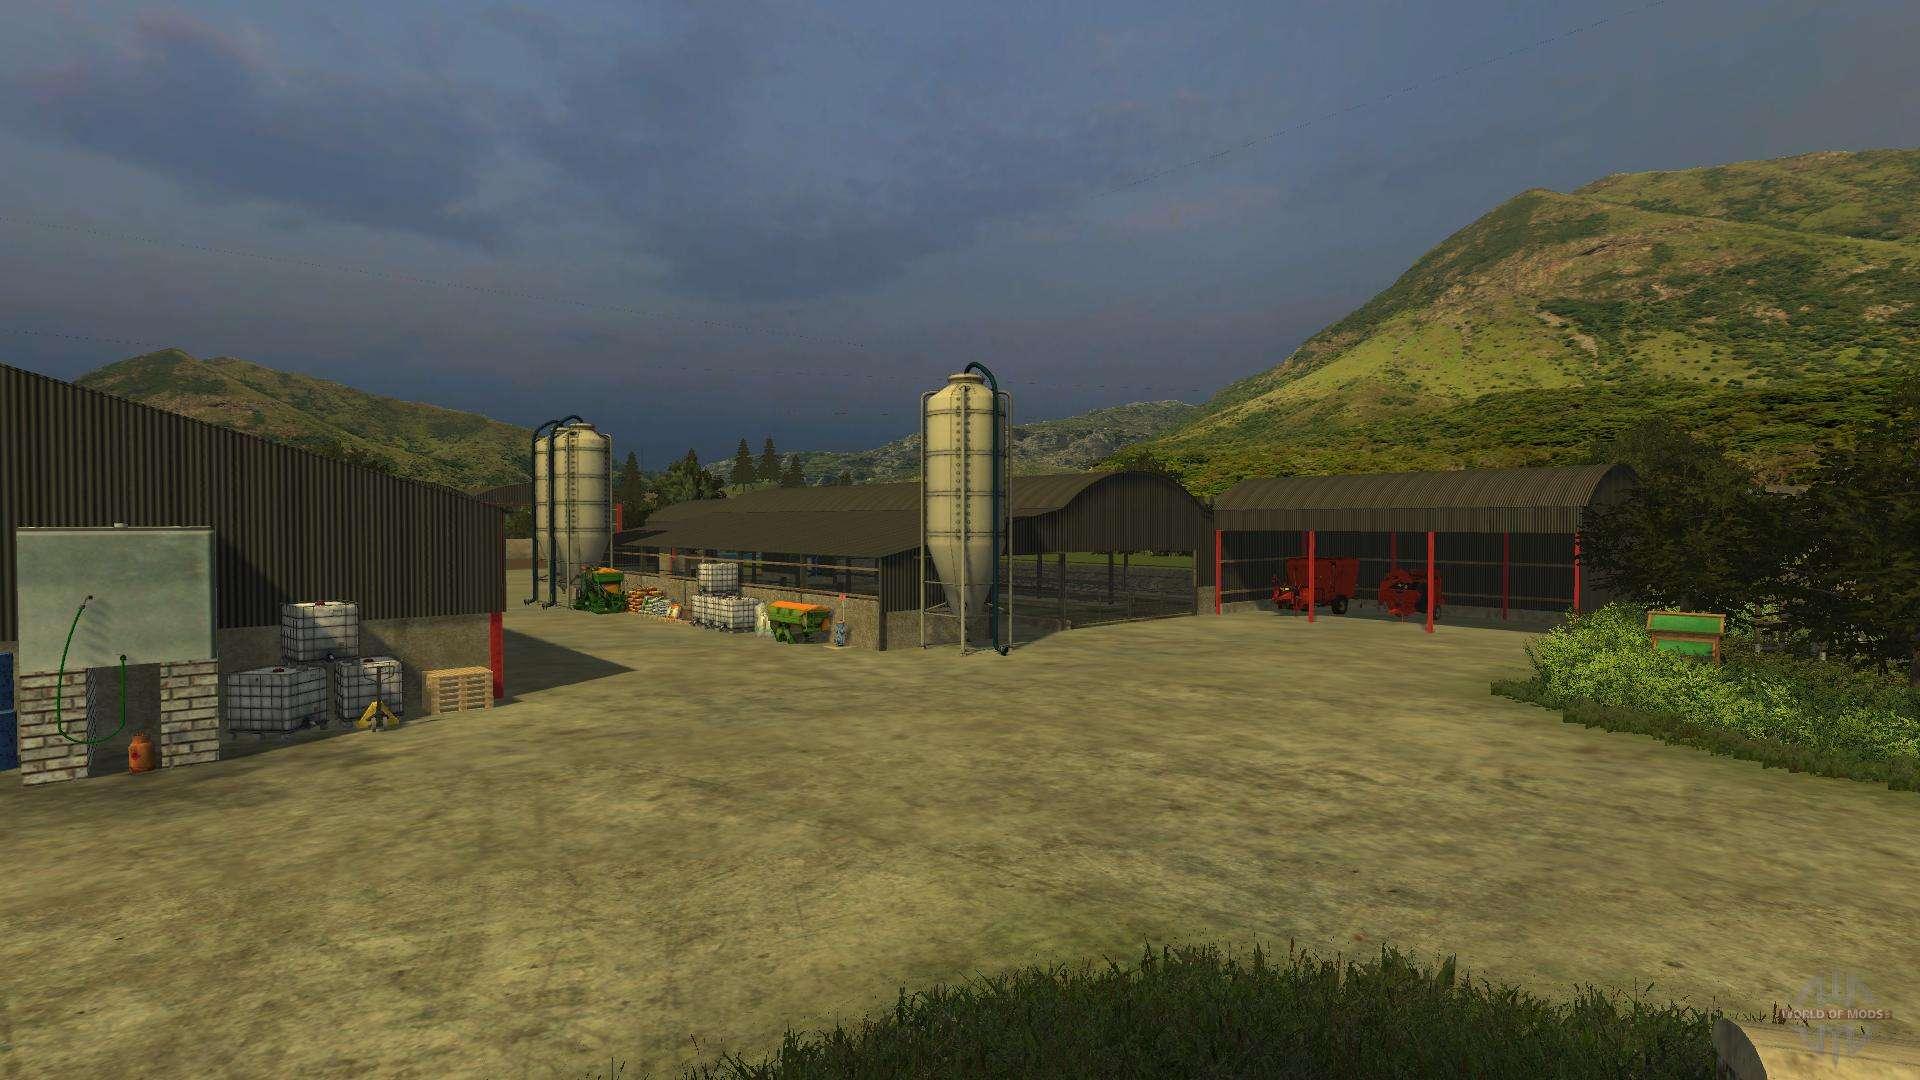 United kingdom uk for farming simulator 2013